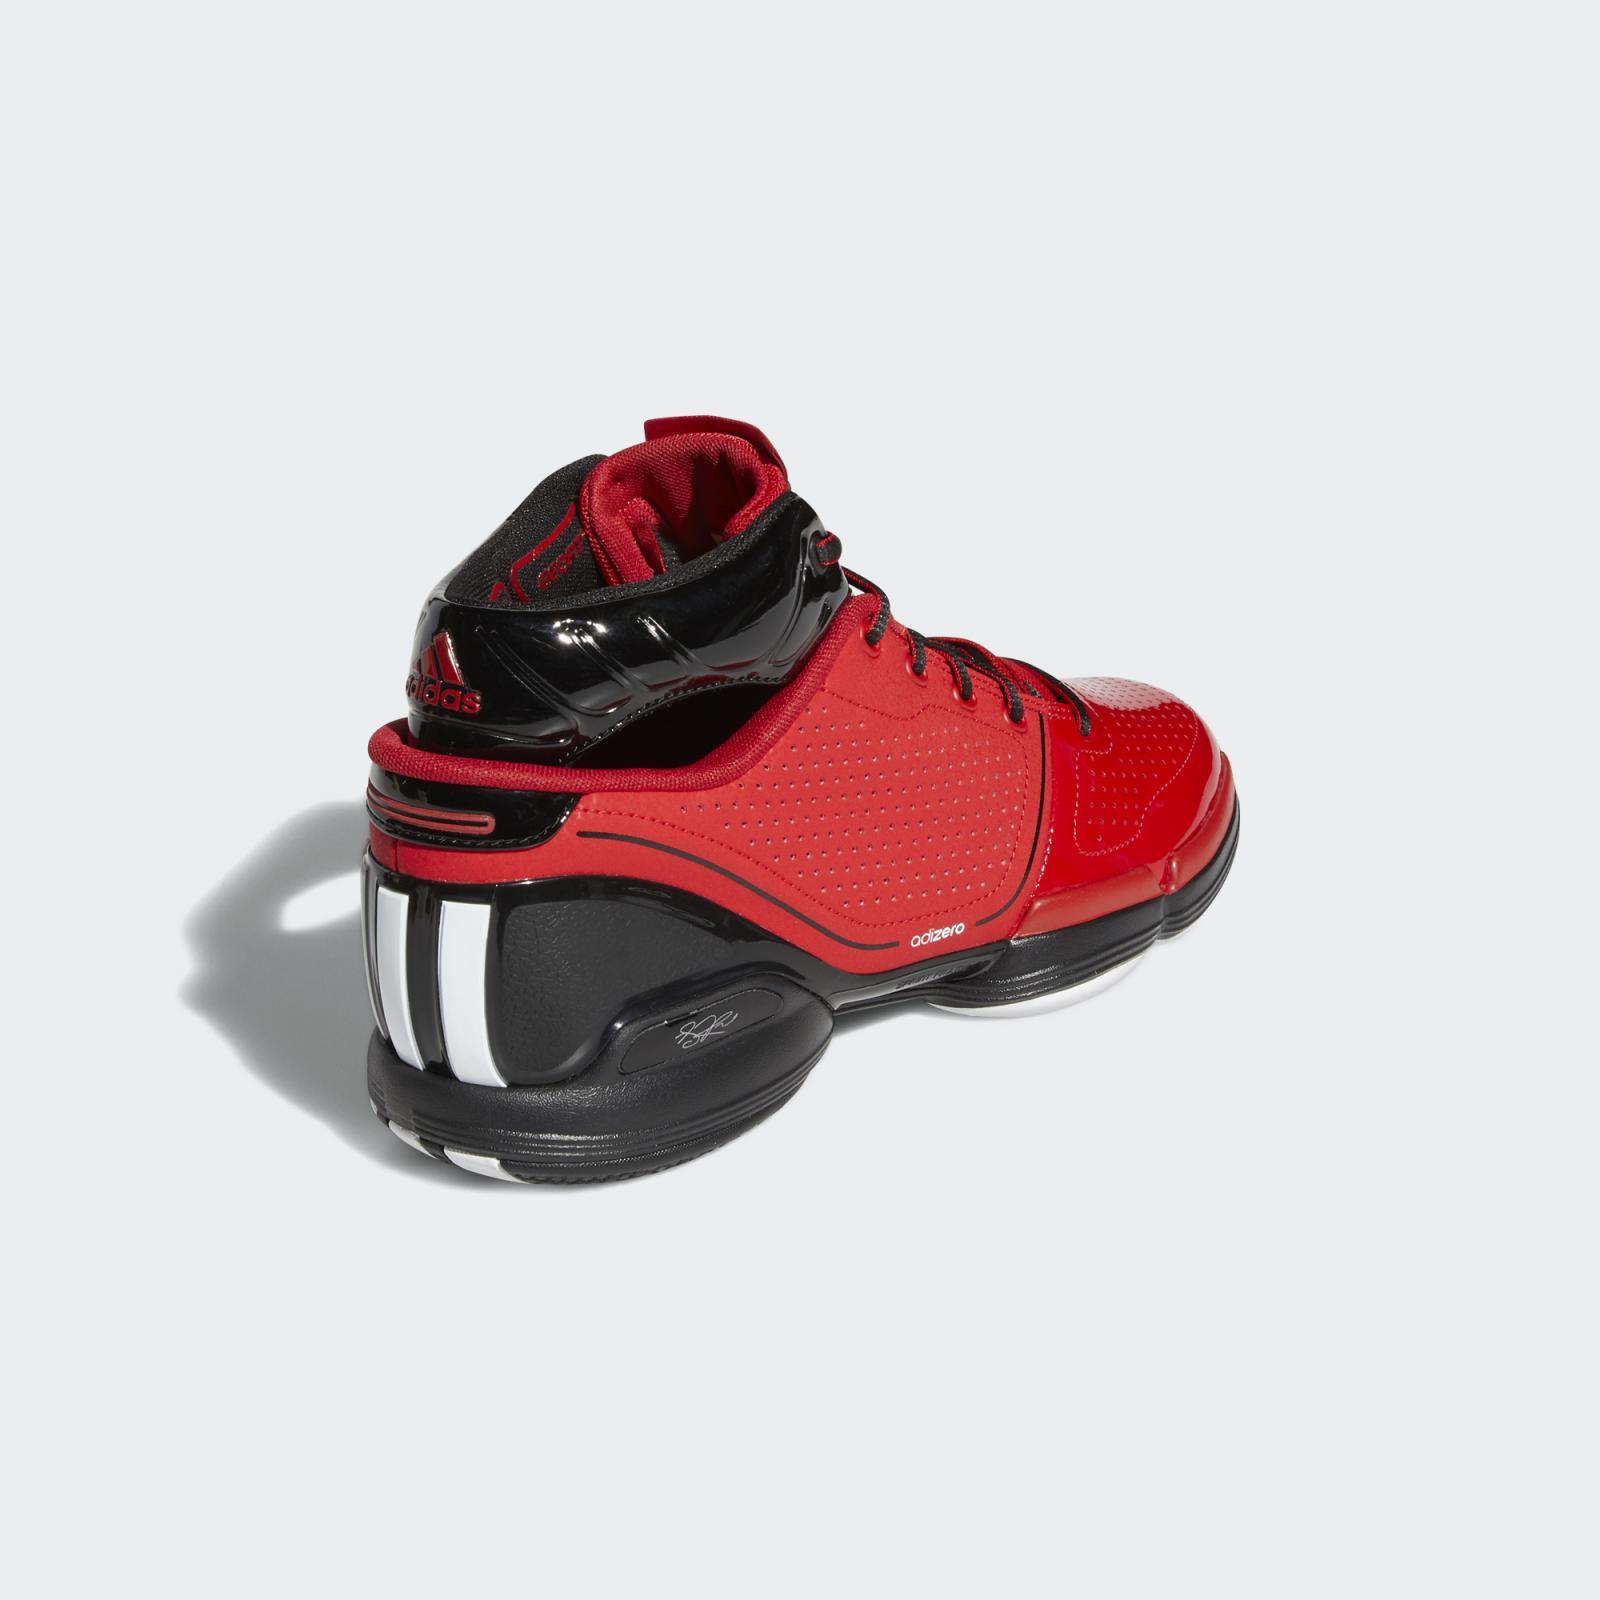 adidas Basketball发布全新白/一号黑色adiZero Rose 1